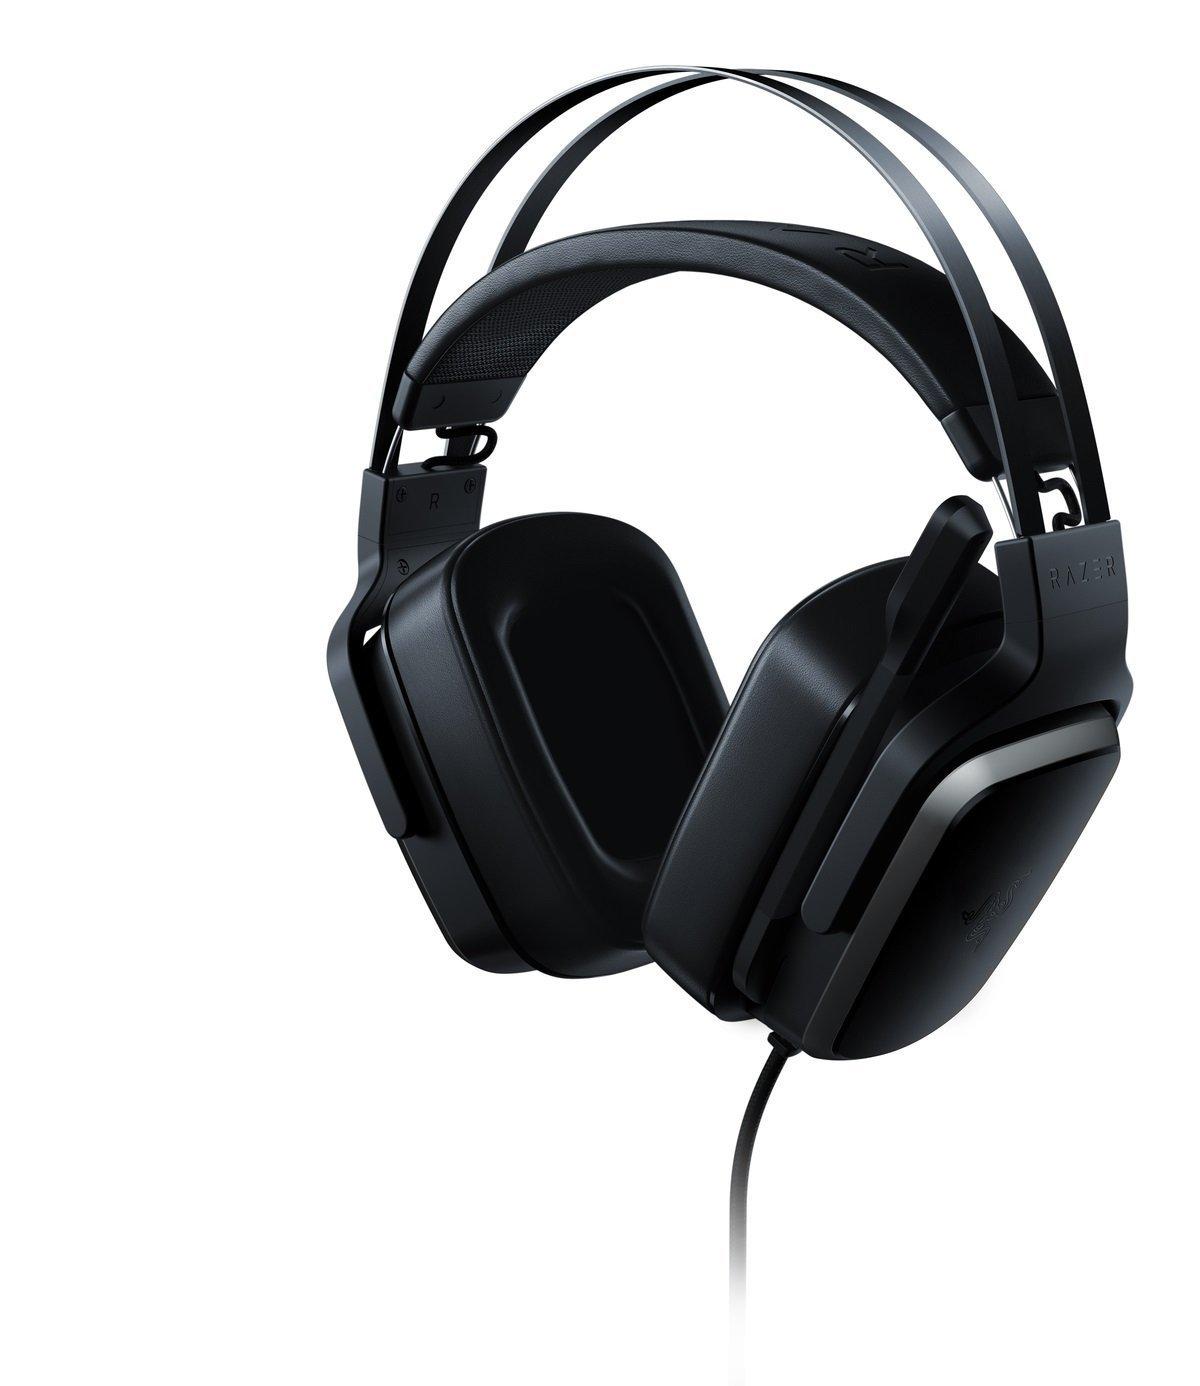 Razer Tiamat 7.1 V2 Gaming Headset for PC Games image